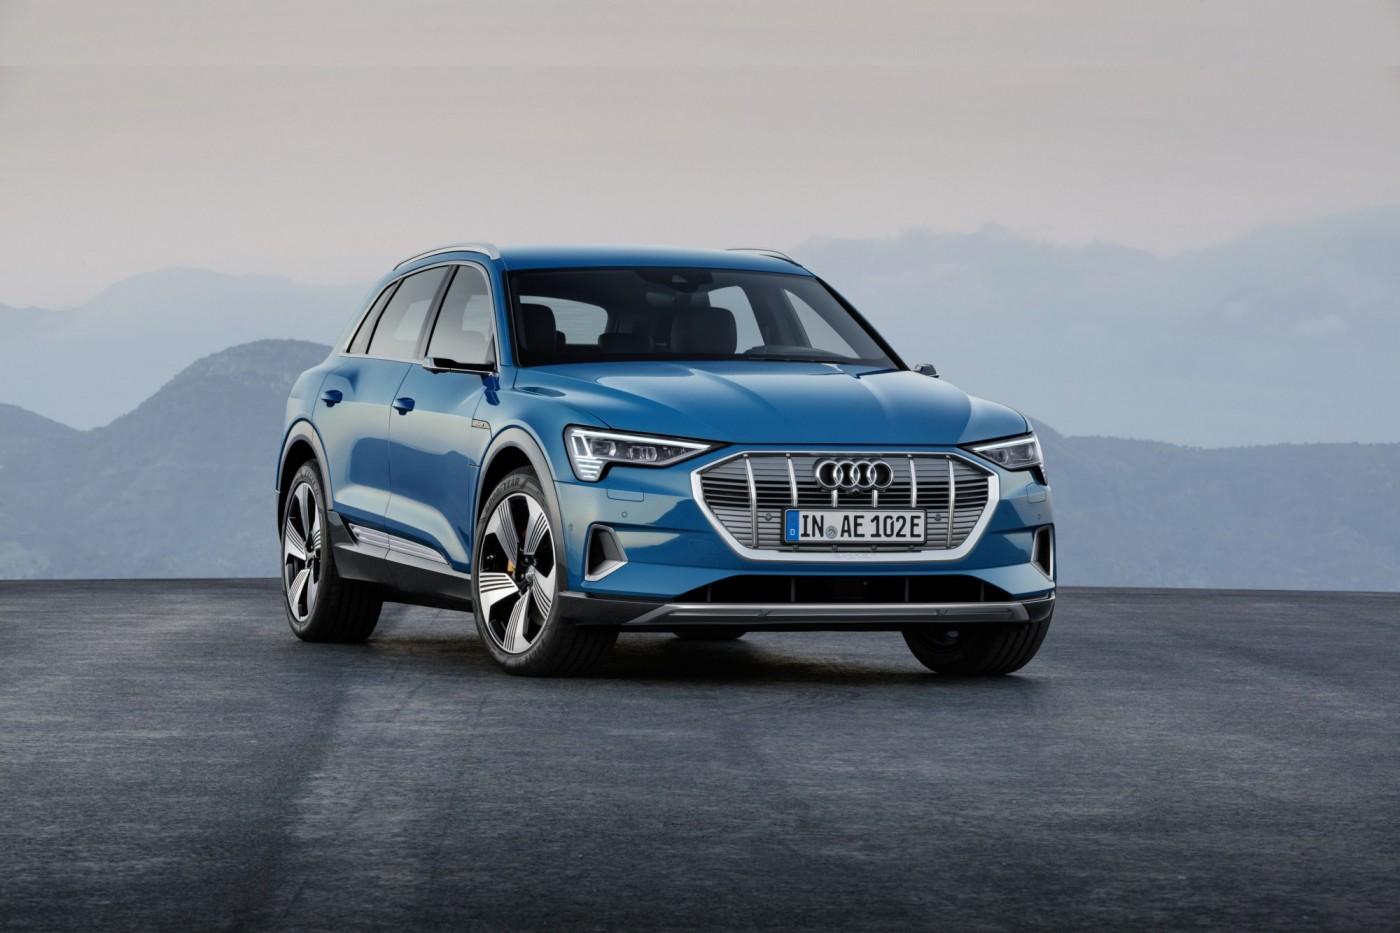 Audi  發展智慧移動 投資百億歐元發展電動車、數位應用及自動駕駛